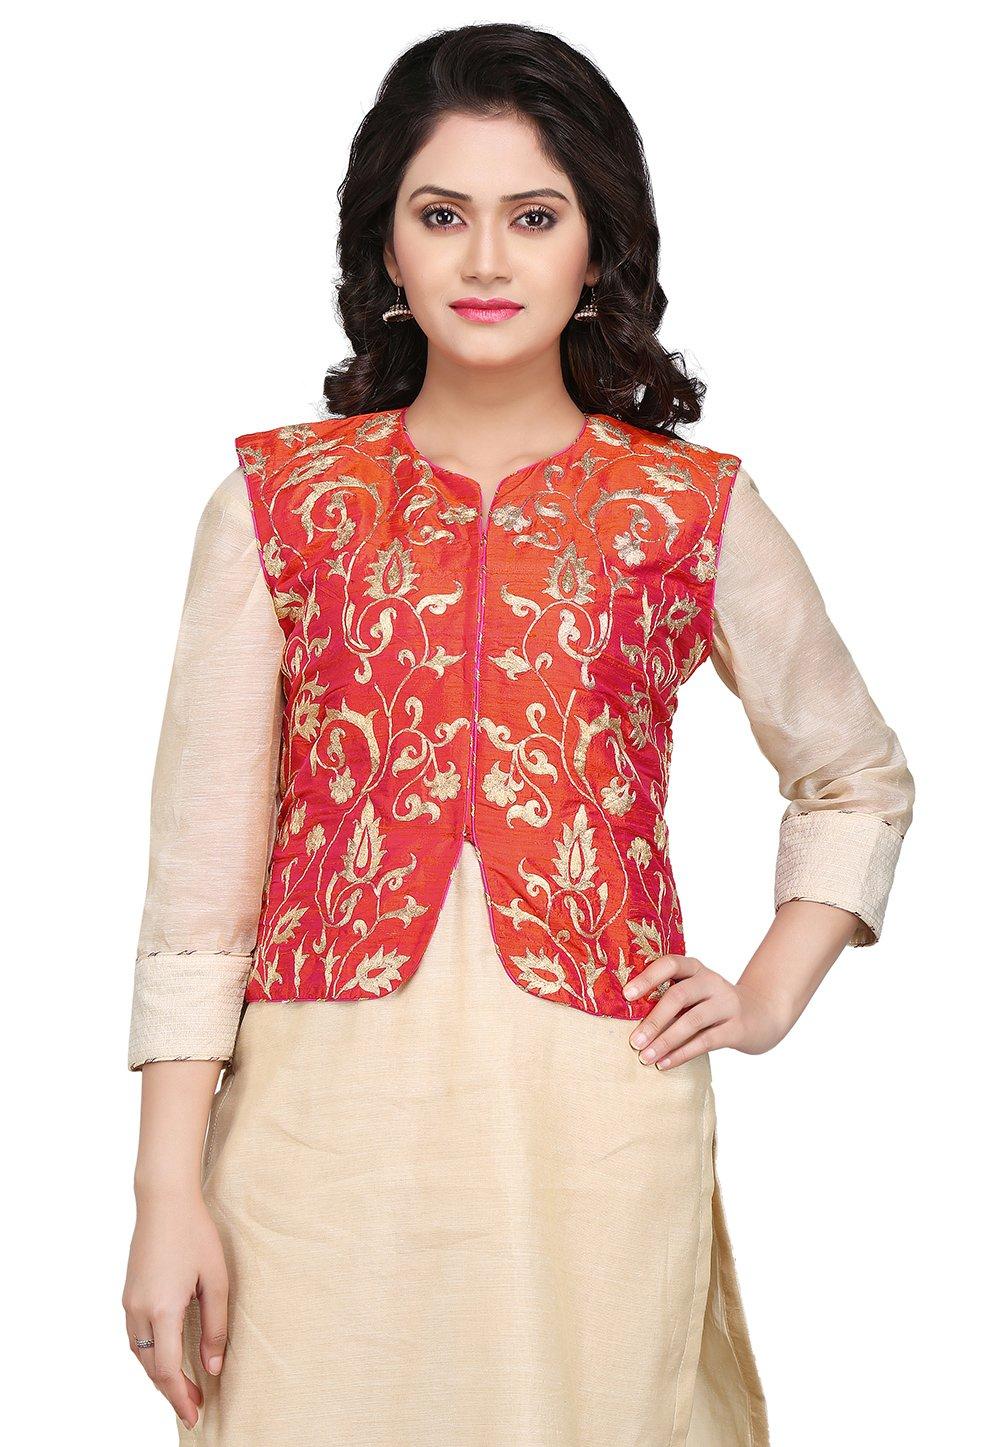 Utsav Fashion Embroidered Dupion Silk Jacket in Red by Utsav Fashion